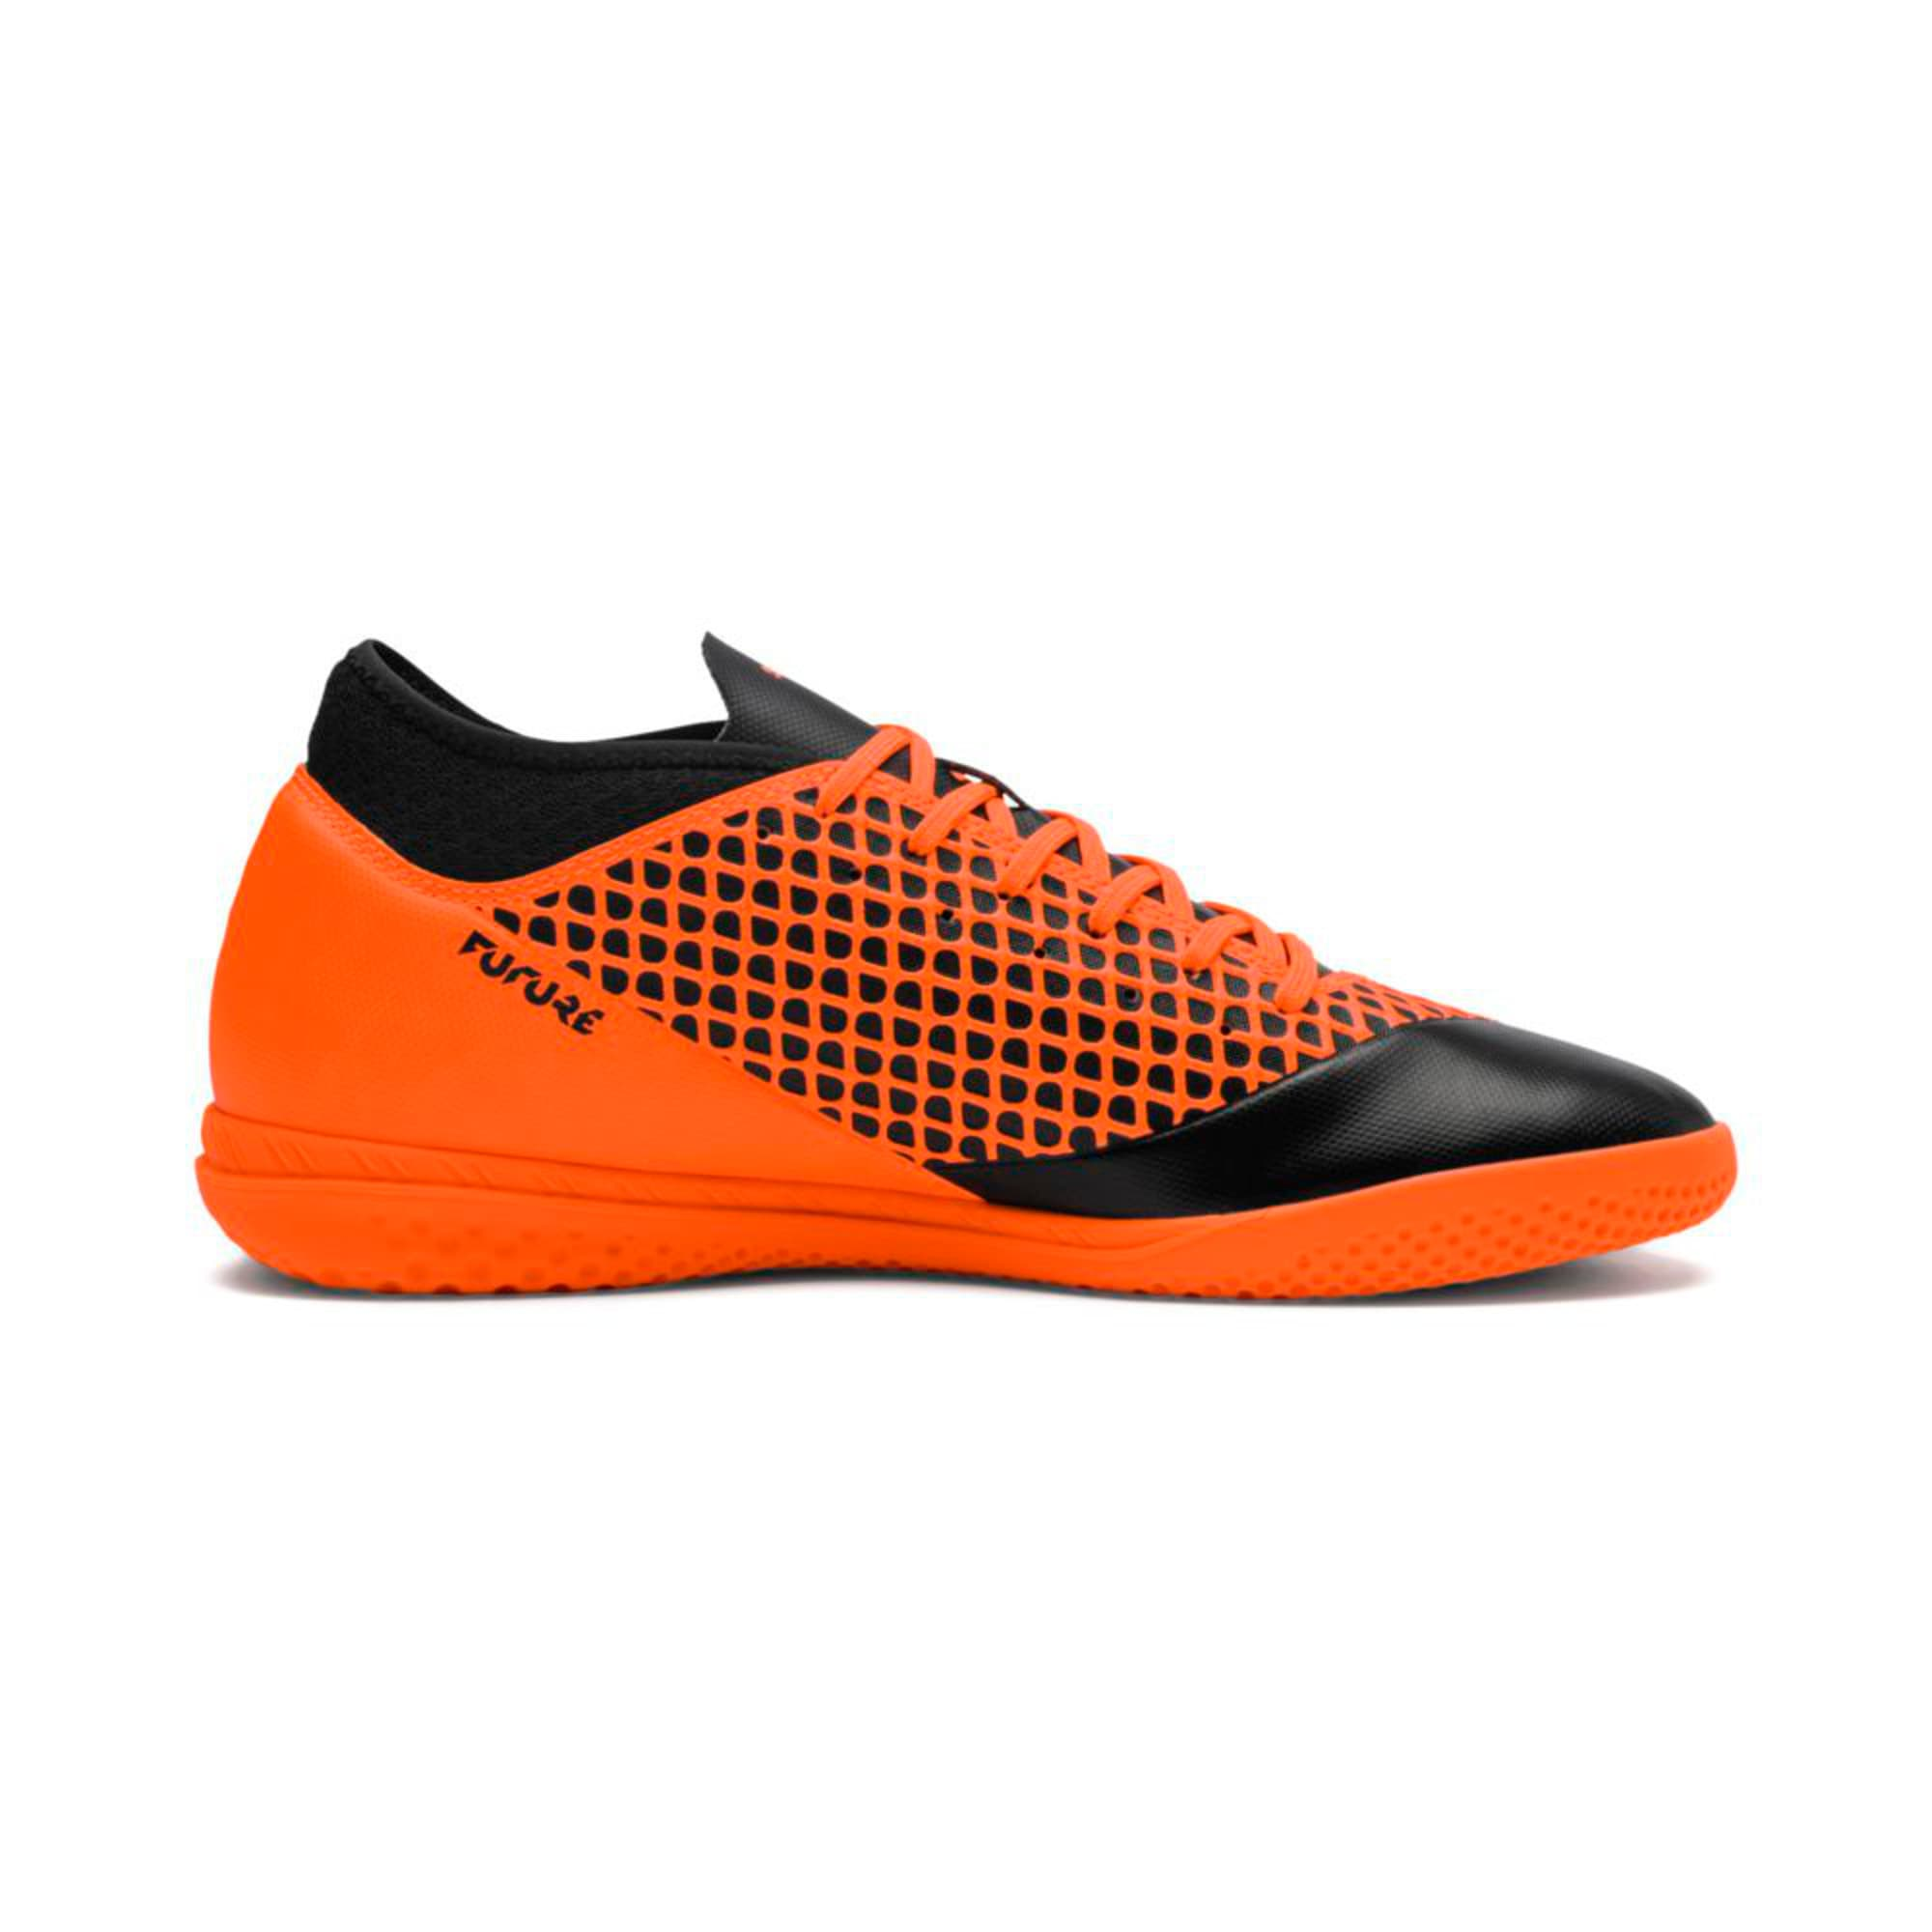 Thumbnail 5 of FUTURE 2.4 IT  Football Shoes, Black-Orange, medium-IND